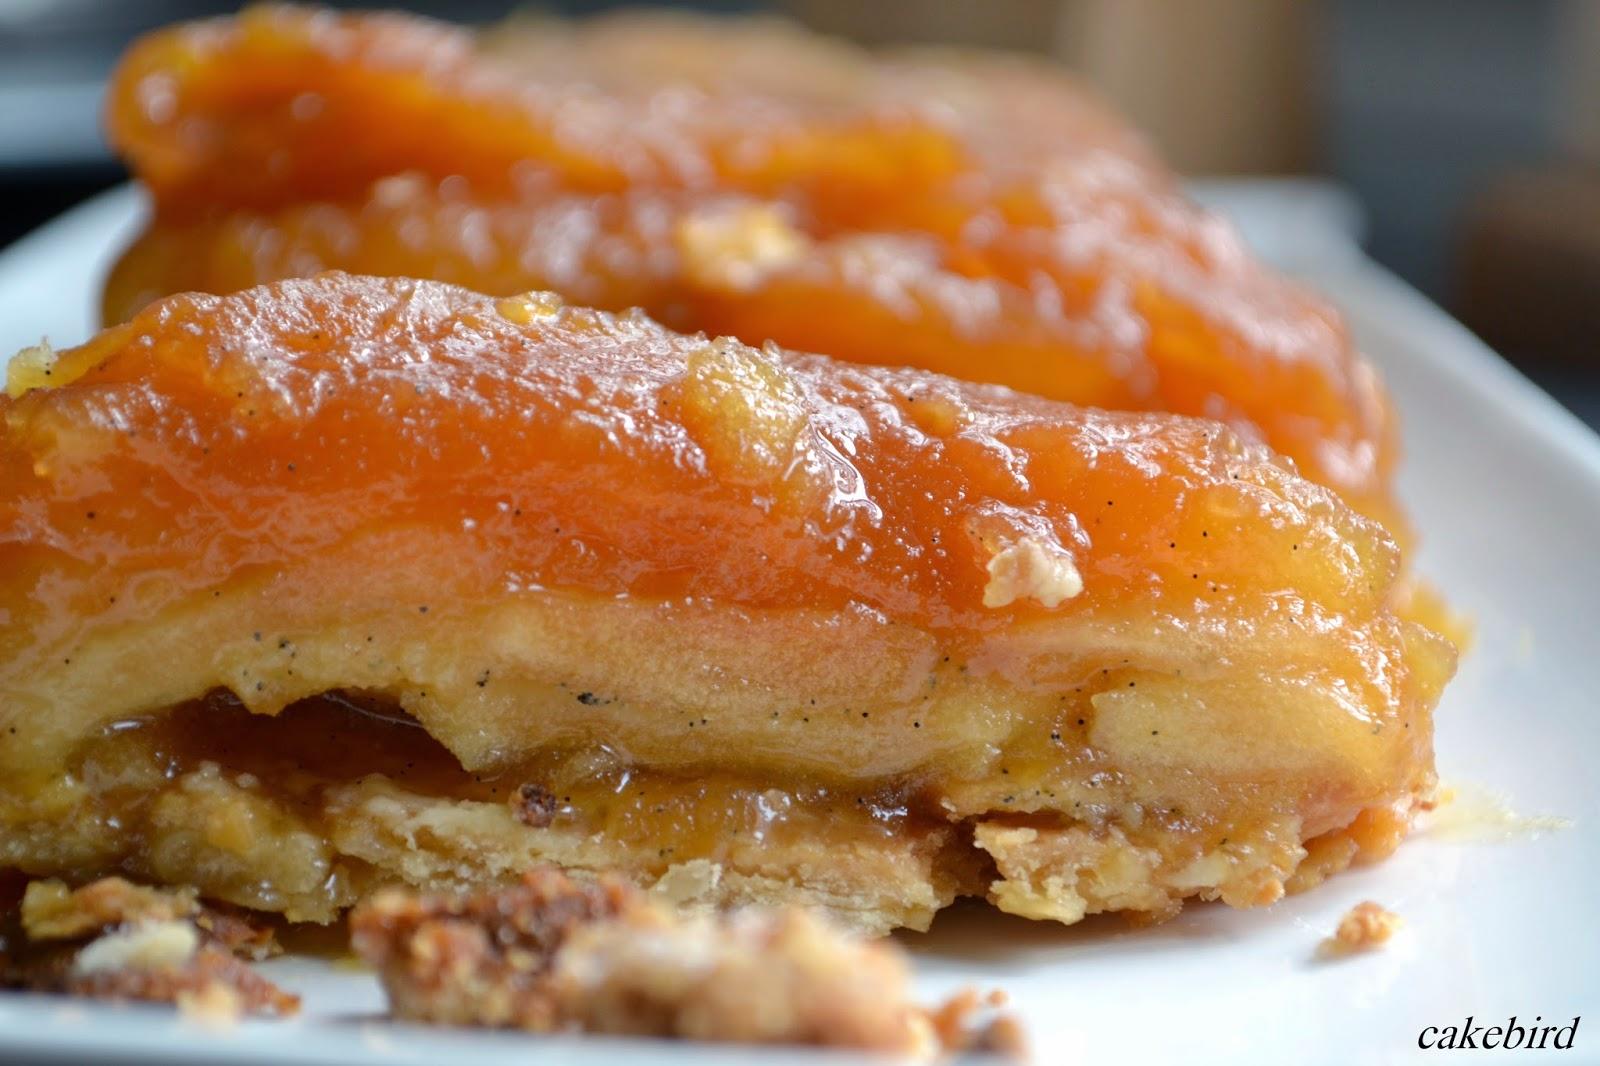 cakebird la tarte tatin selon philippe conticini